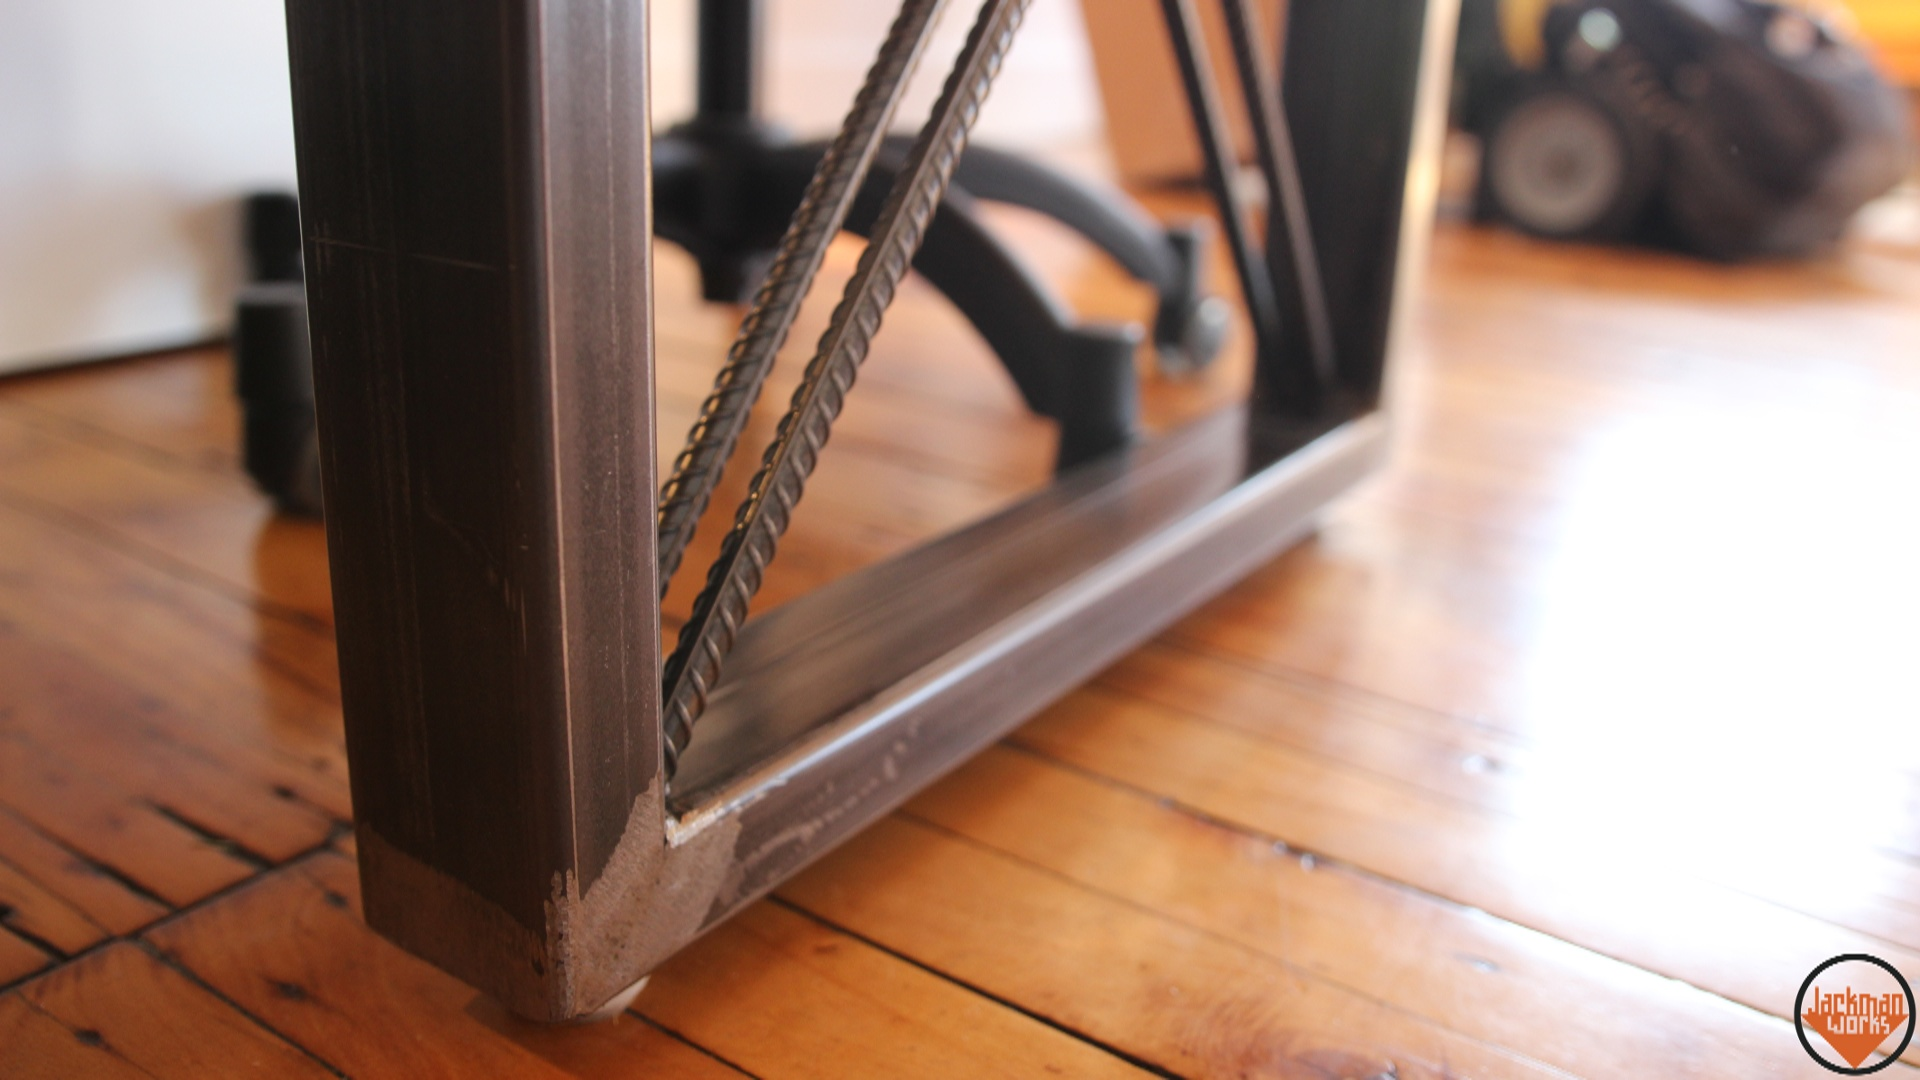 ... Frame,tube Steel,rebar,rebar Furniture,modern,butcherblock,maple,ikea,ikea  Hack,furniture,industrial Furniture Design